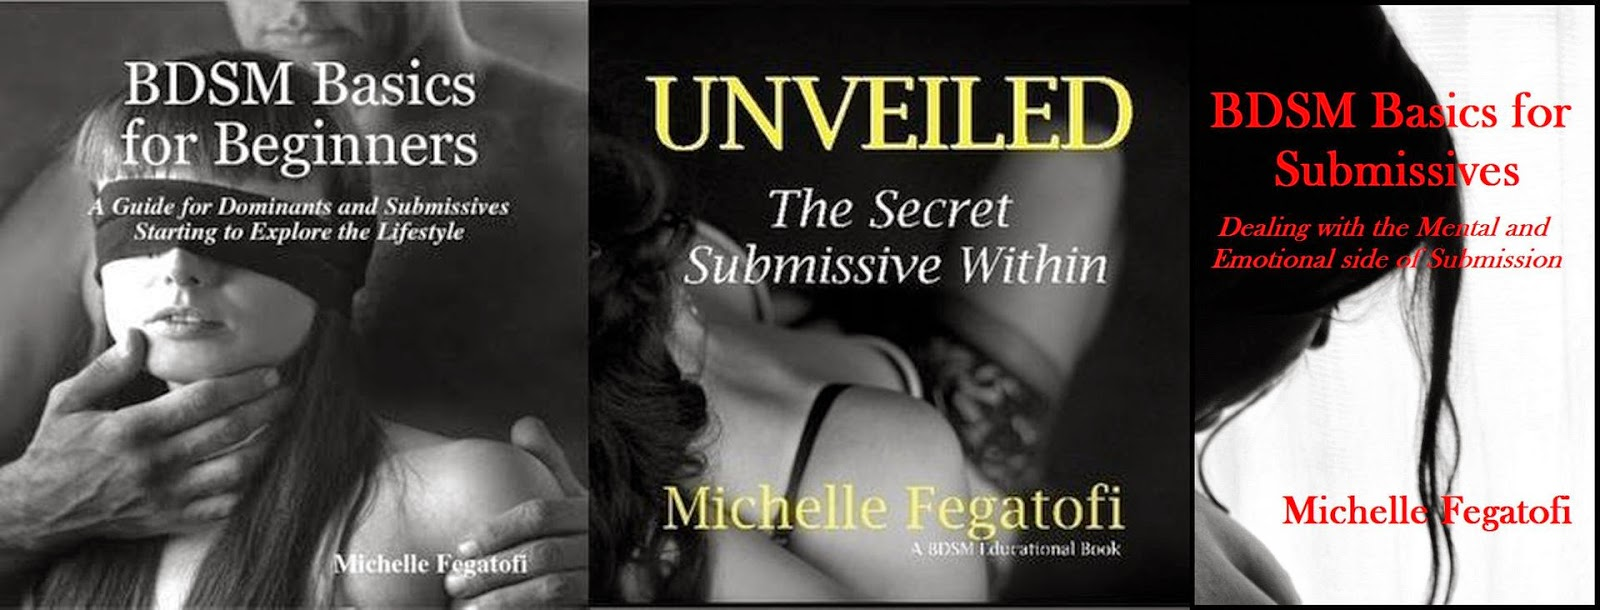 Michelle Fegatofi BDSM Educational Books